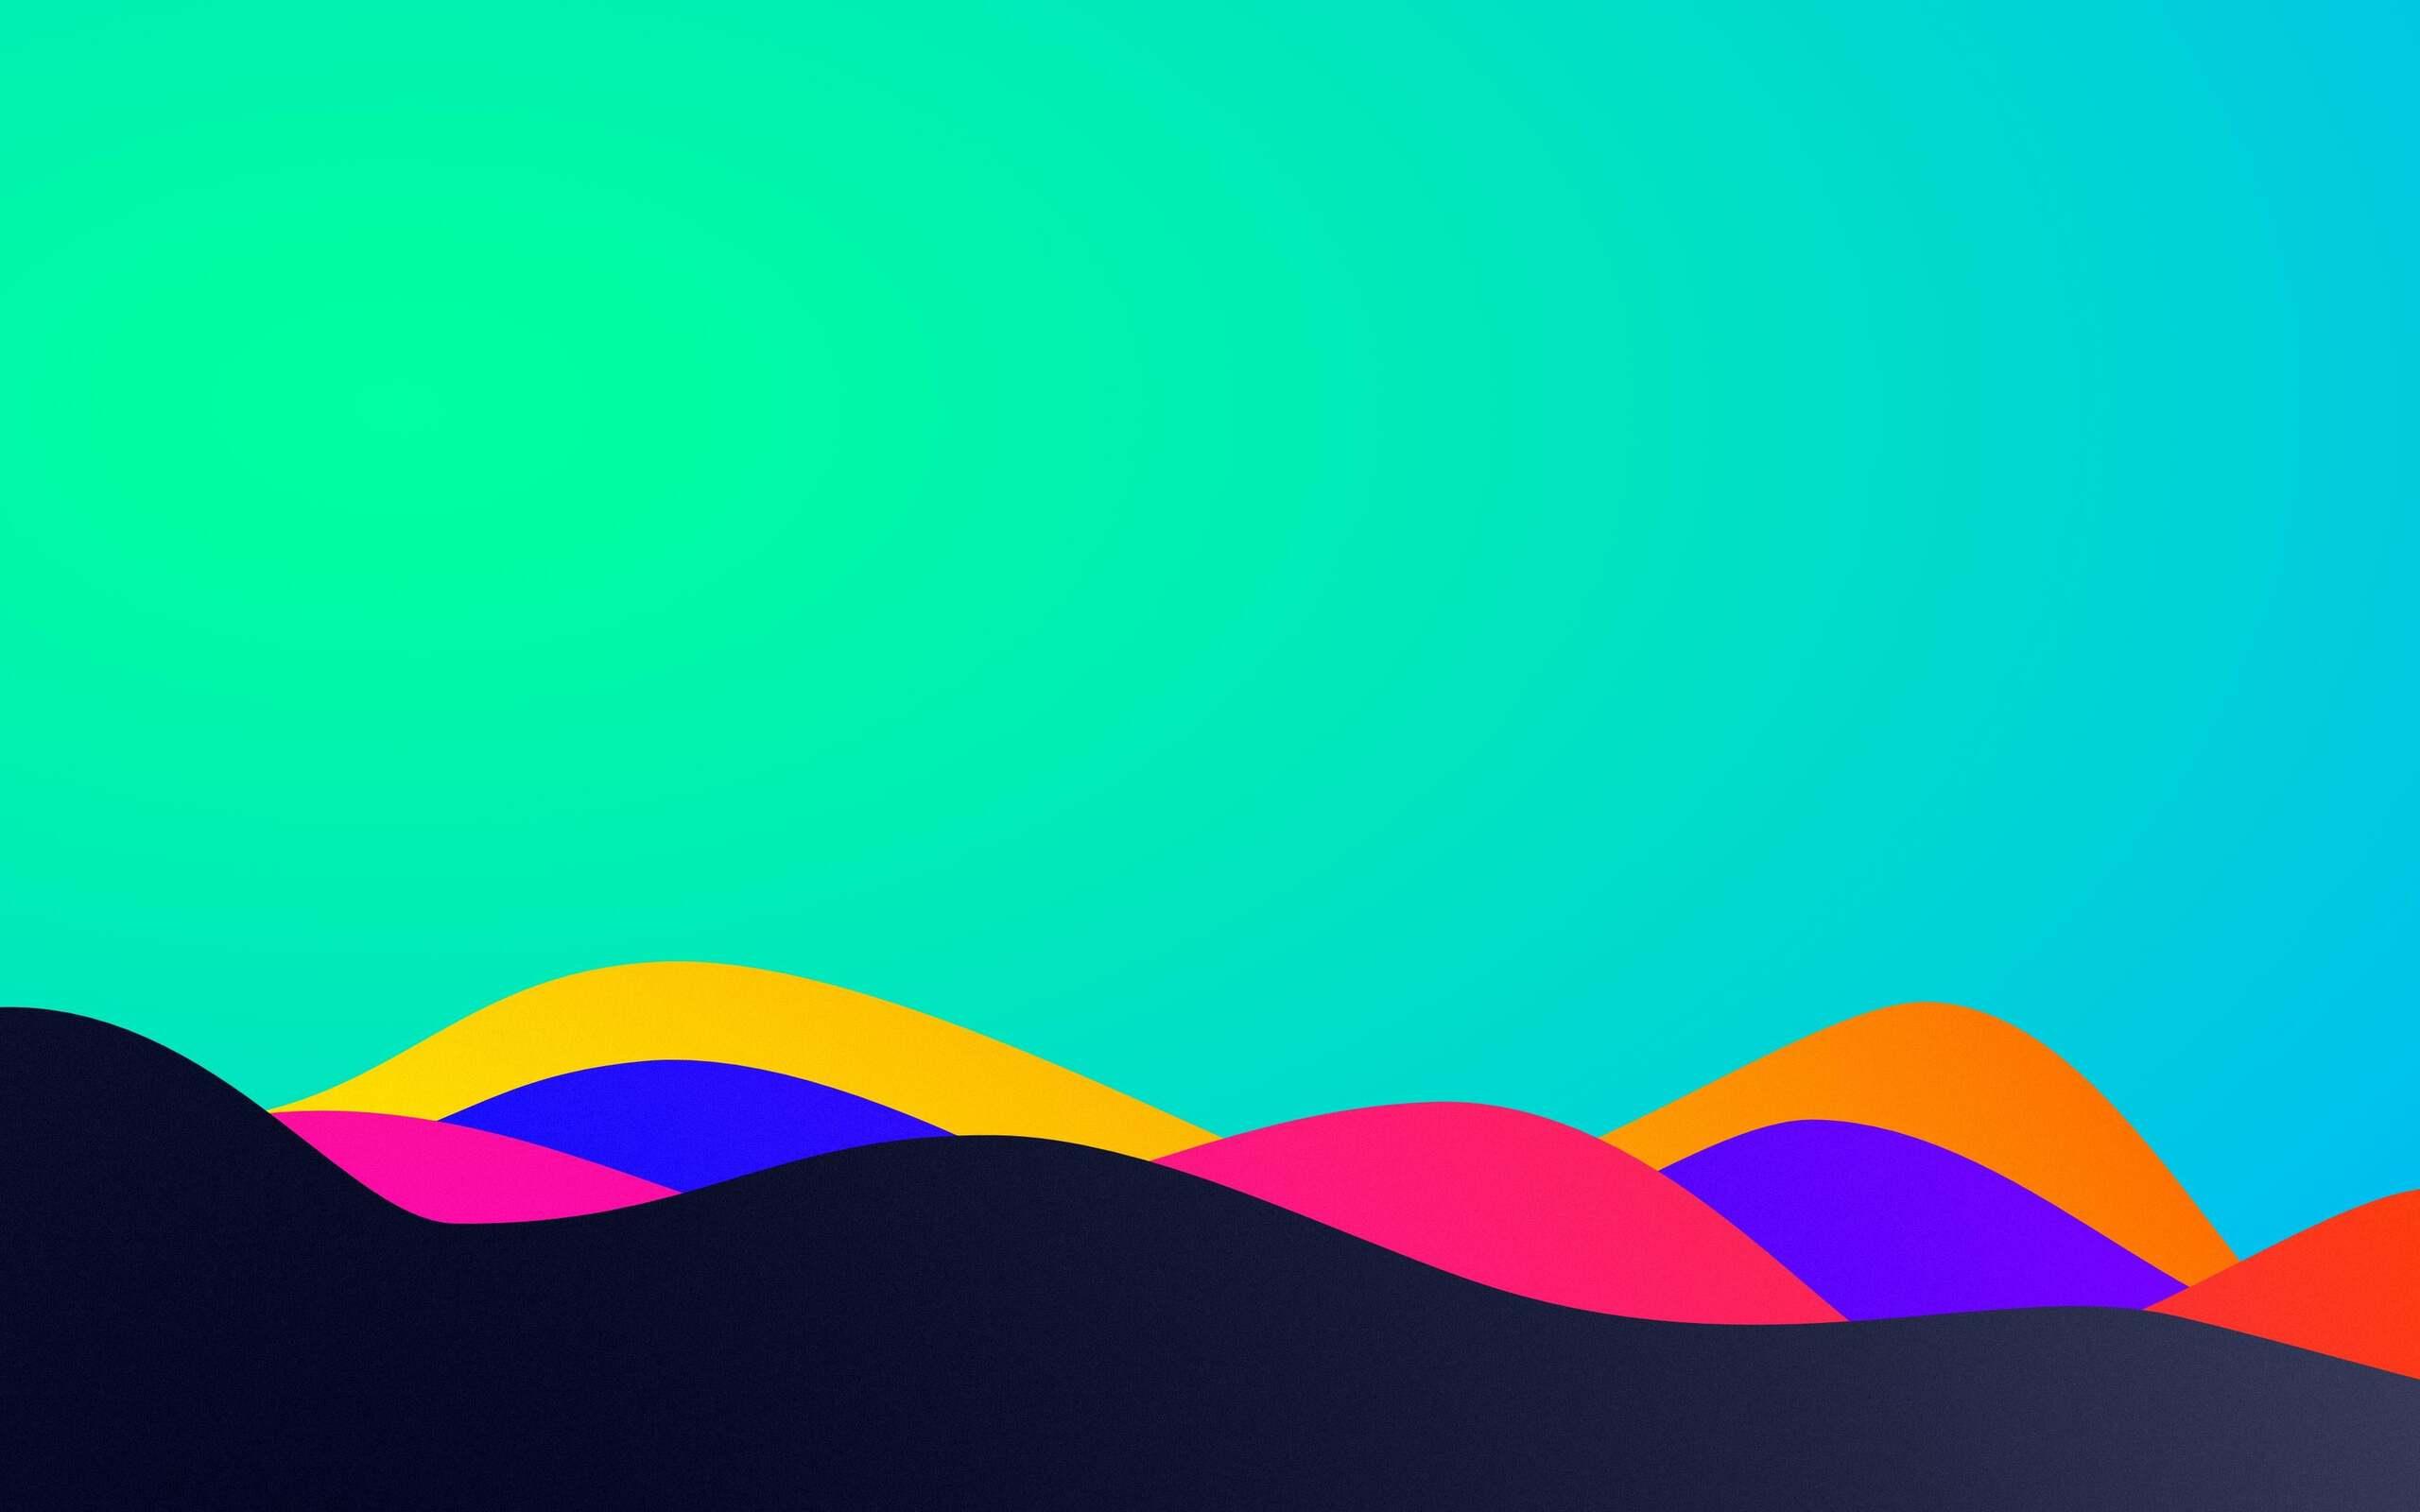 abstract-teal-waves-4k-qx.jpg